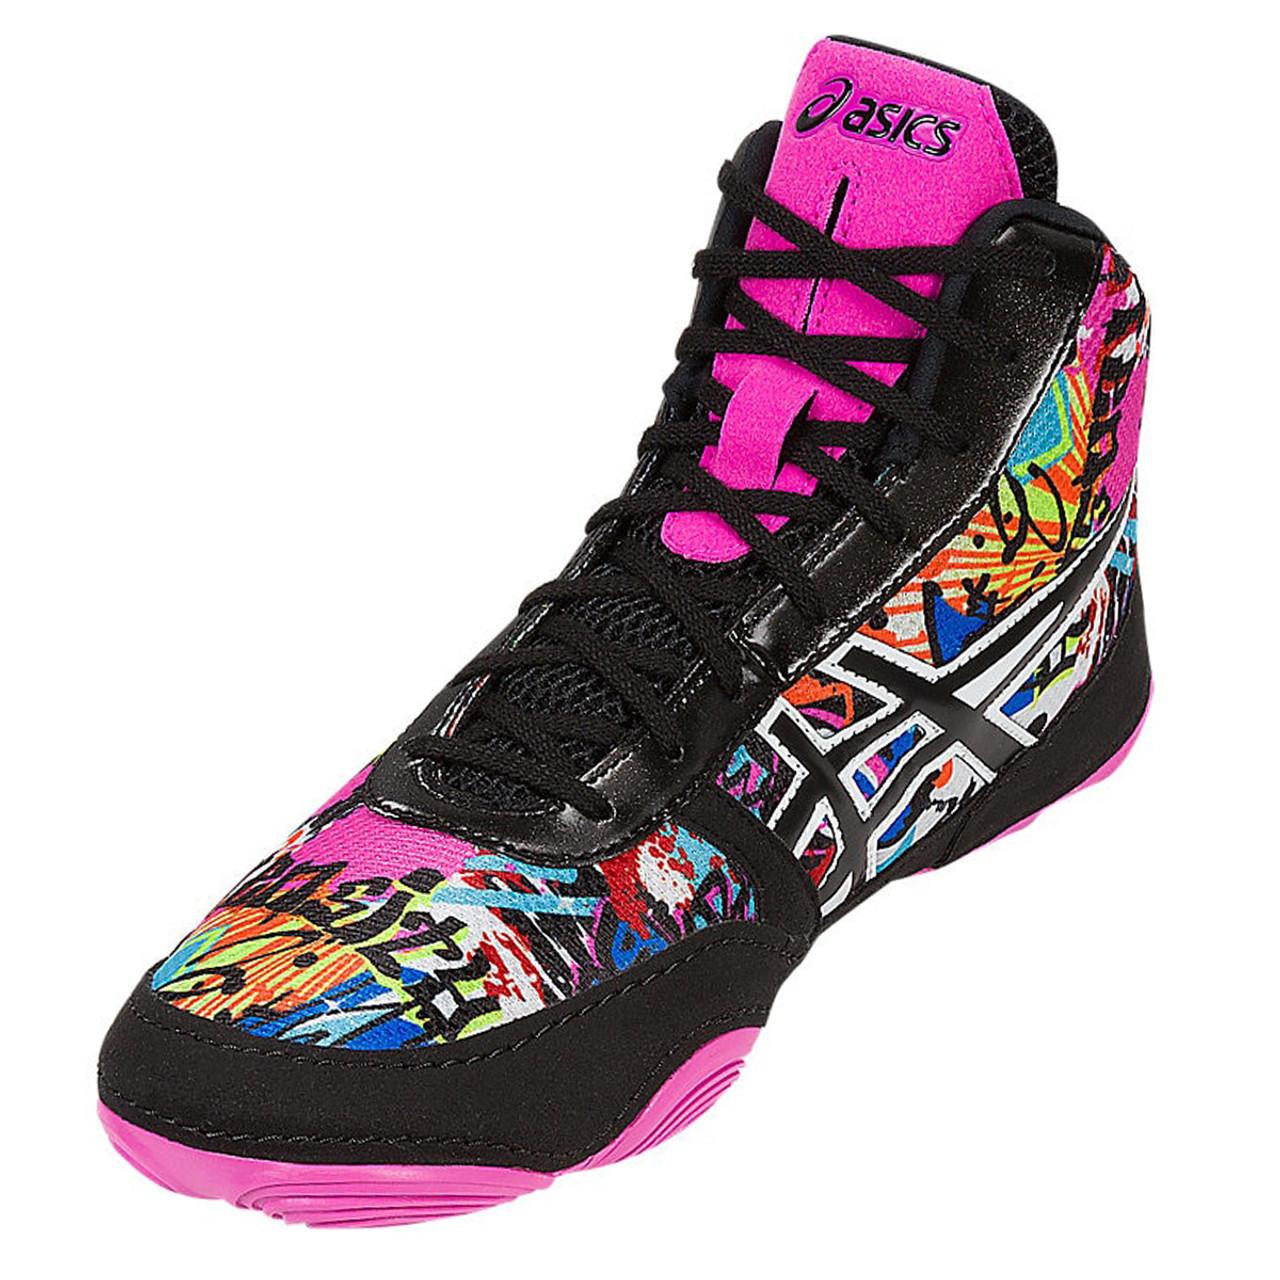 567c514c060312 Asics JB Elite V2.0 Limited Edition Men s Wrestling Shoes - Graffiti ...